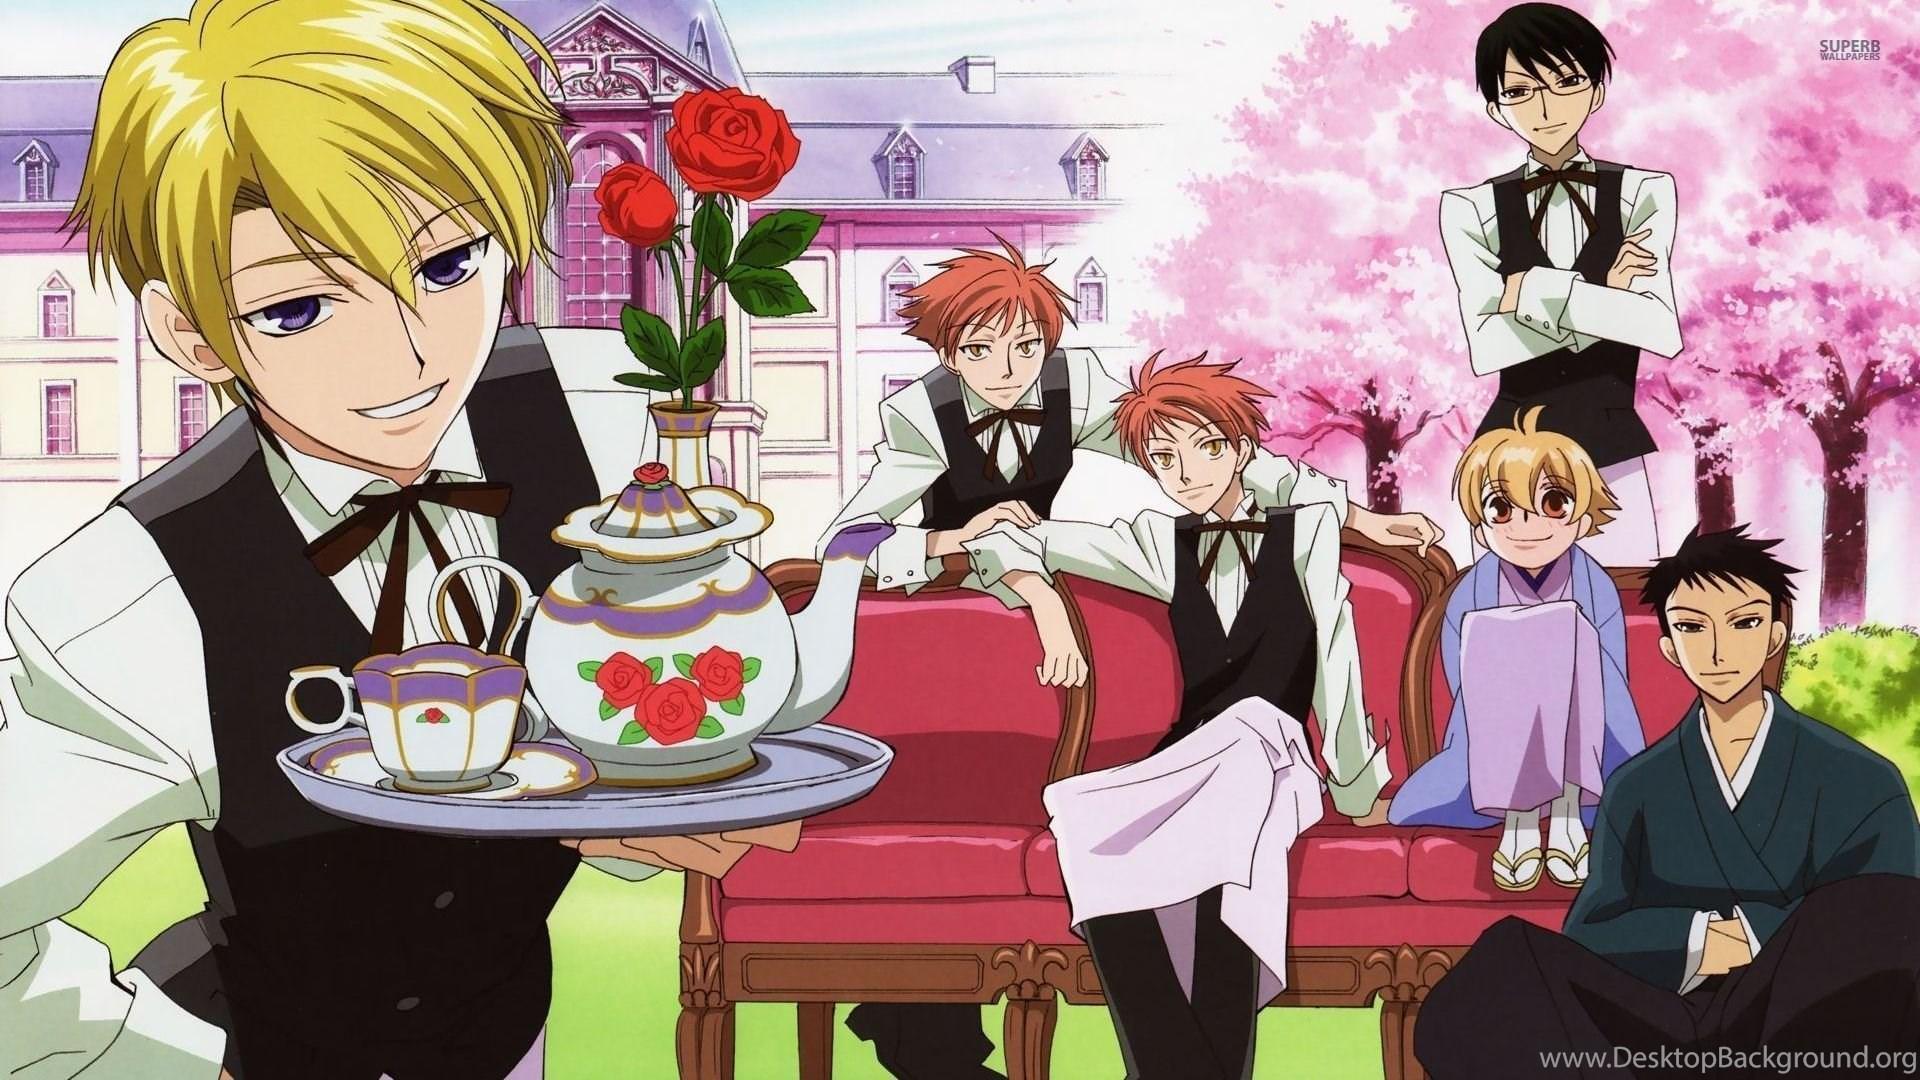 High school romance anime like Diabolik Lovers, Ouran High School Host Club